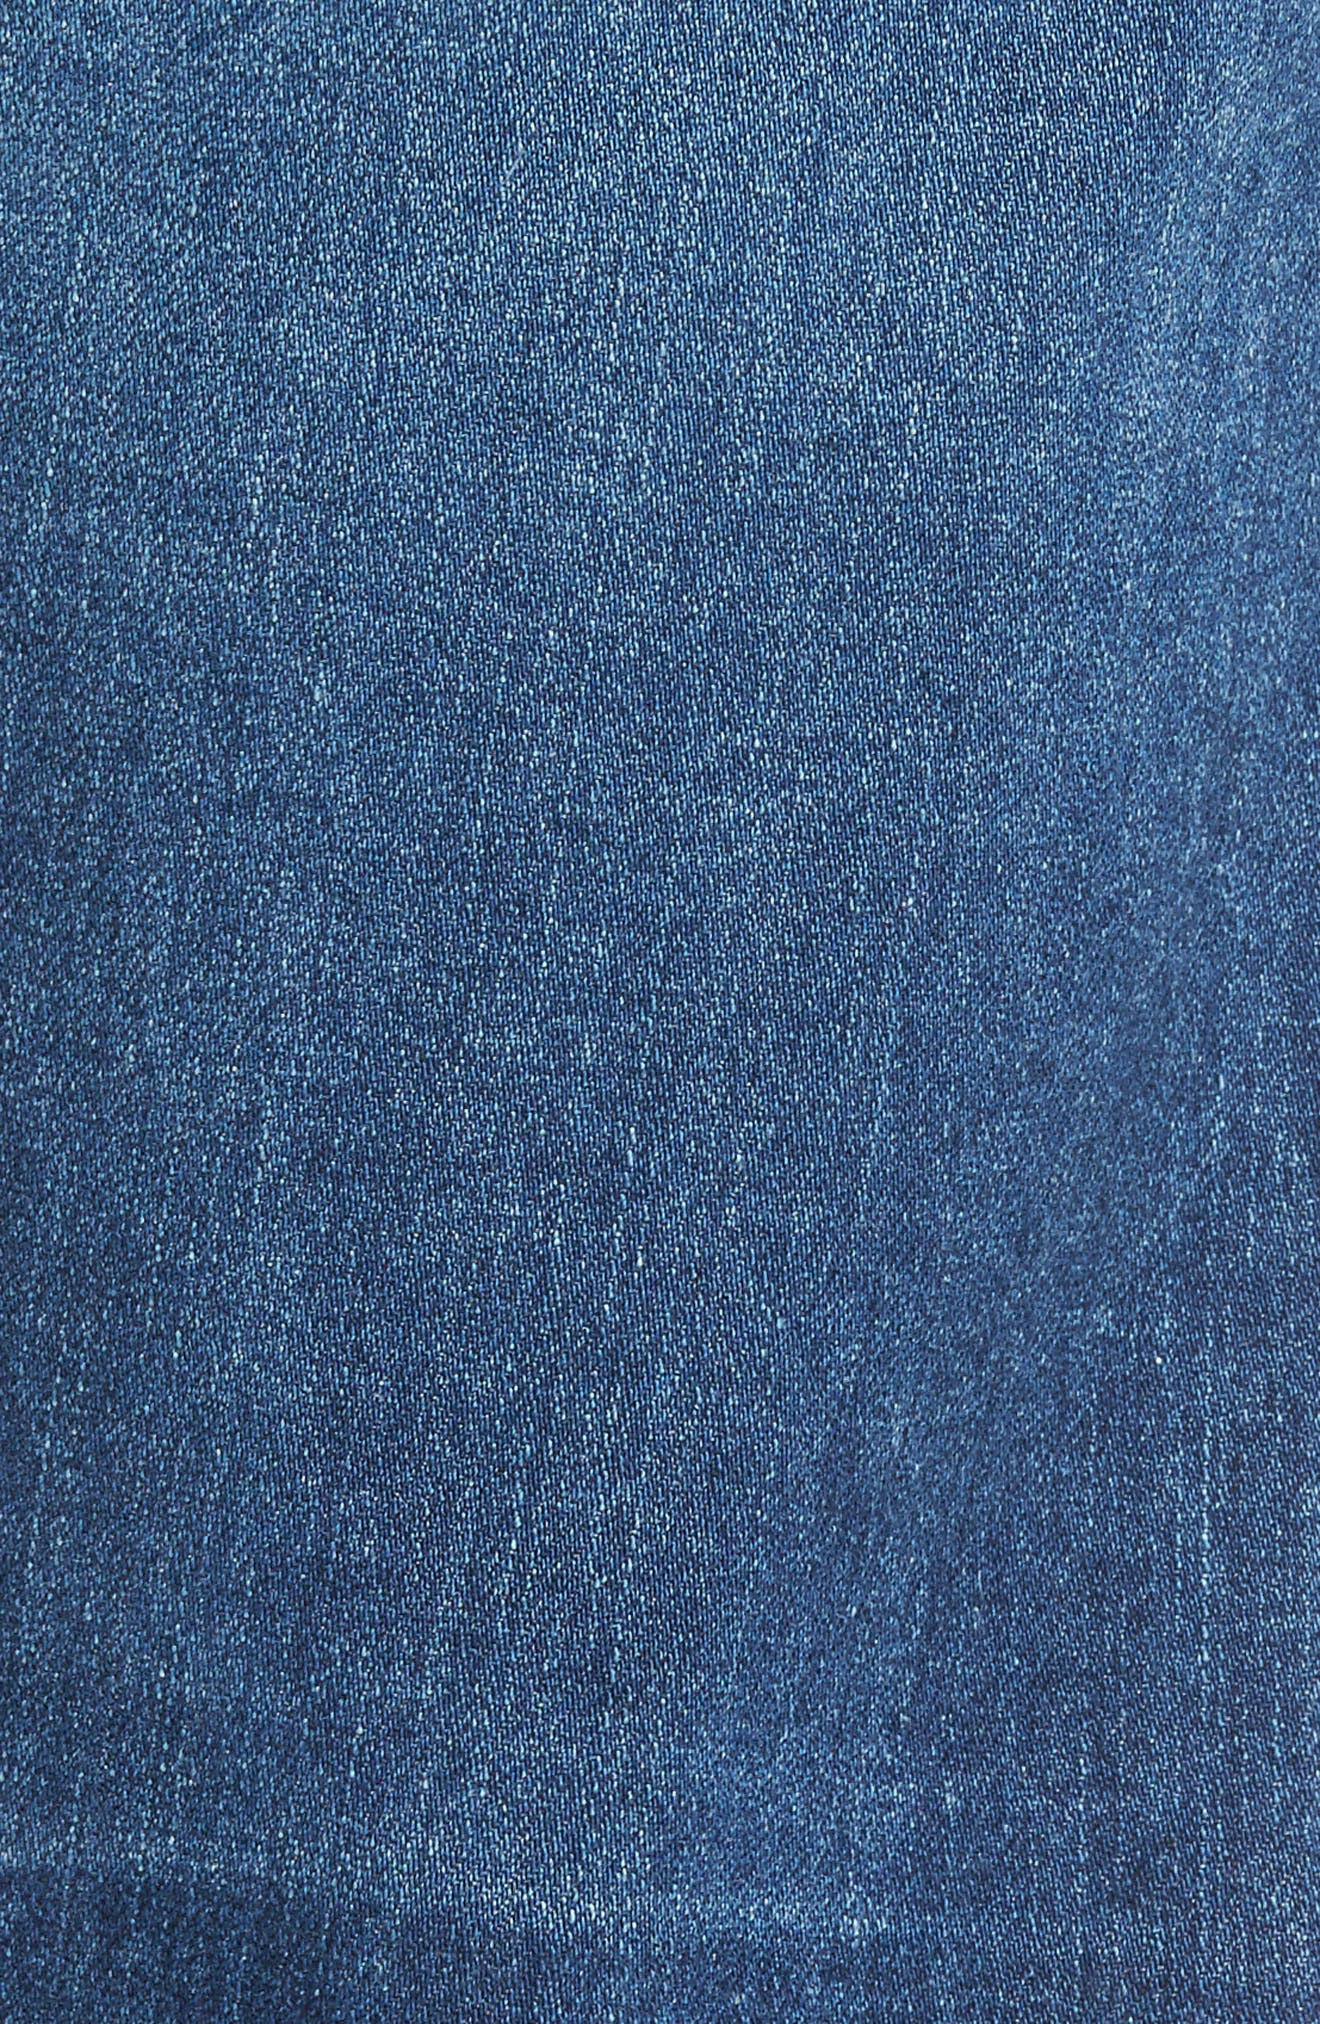 Graduate Slim Straight Leg Jeans,                             Alternate thumbnail 5, color,                             11 Years Delom